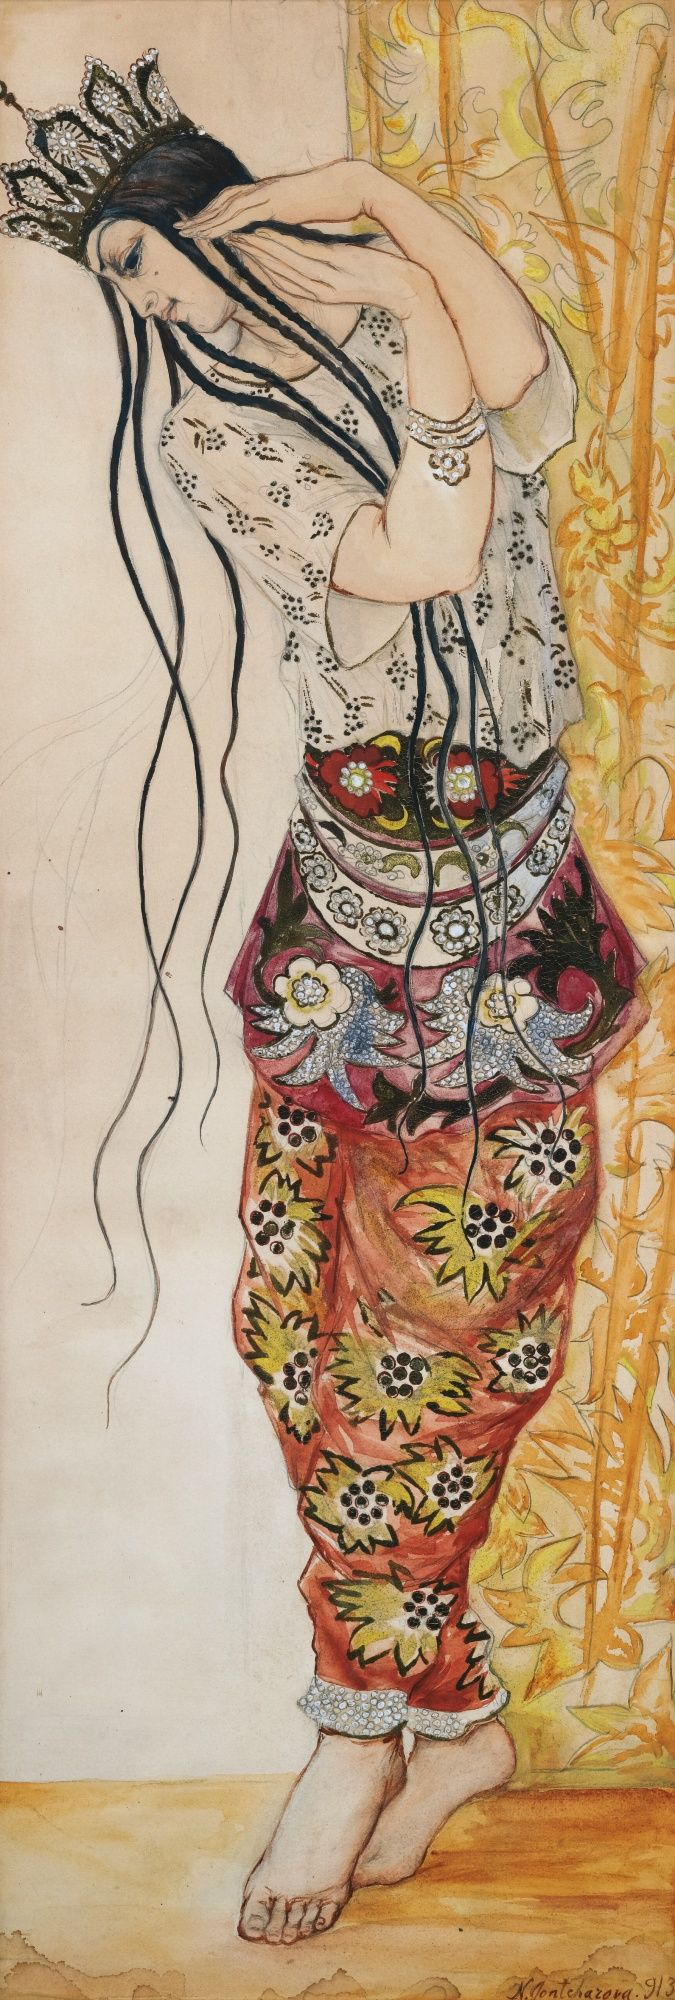 By Natalia Goncharova (1881-1962)  was a Russian avant-garde artist, painter, costume designer, writer, illustrator, and set designer.